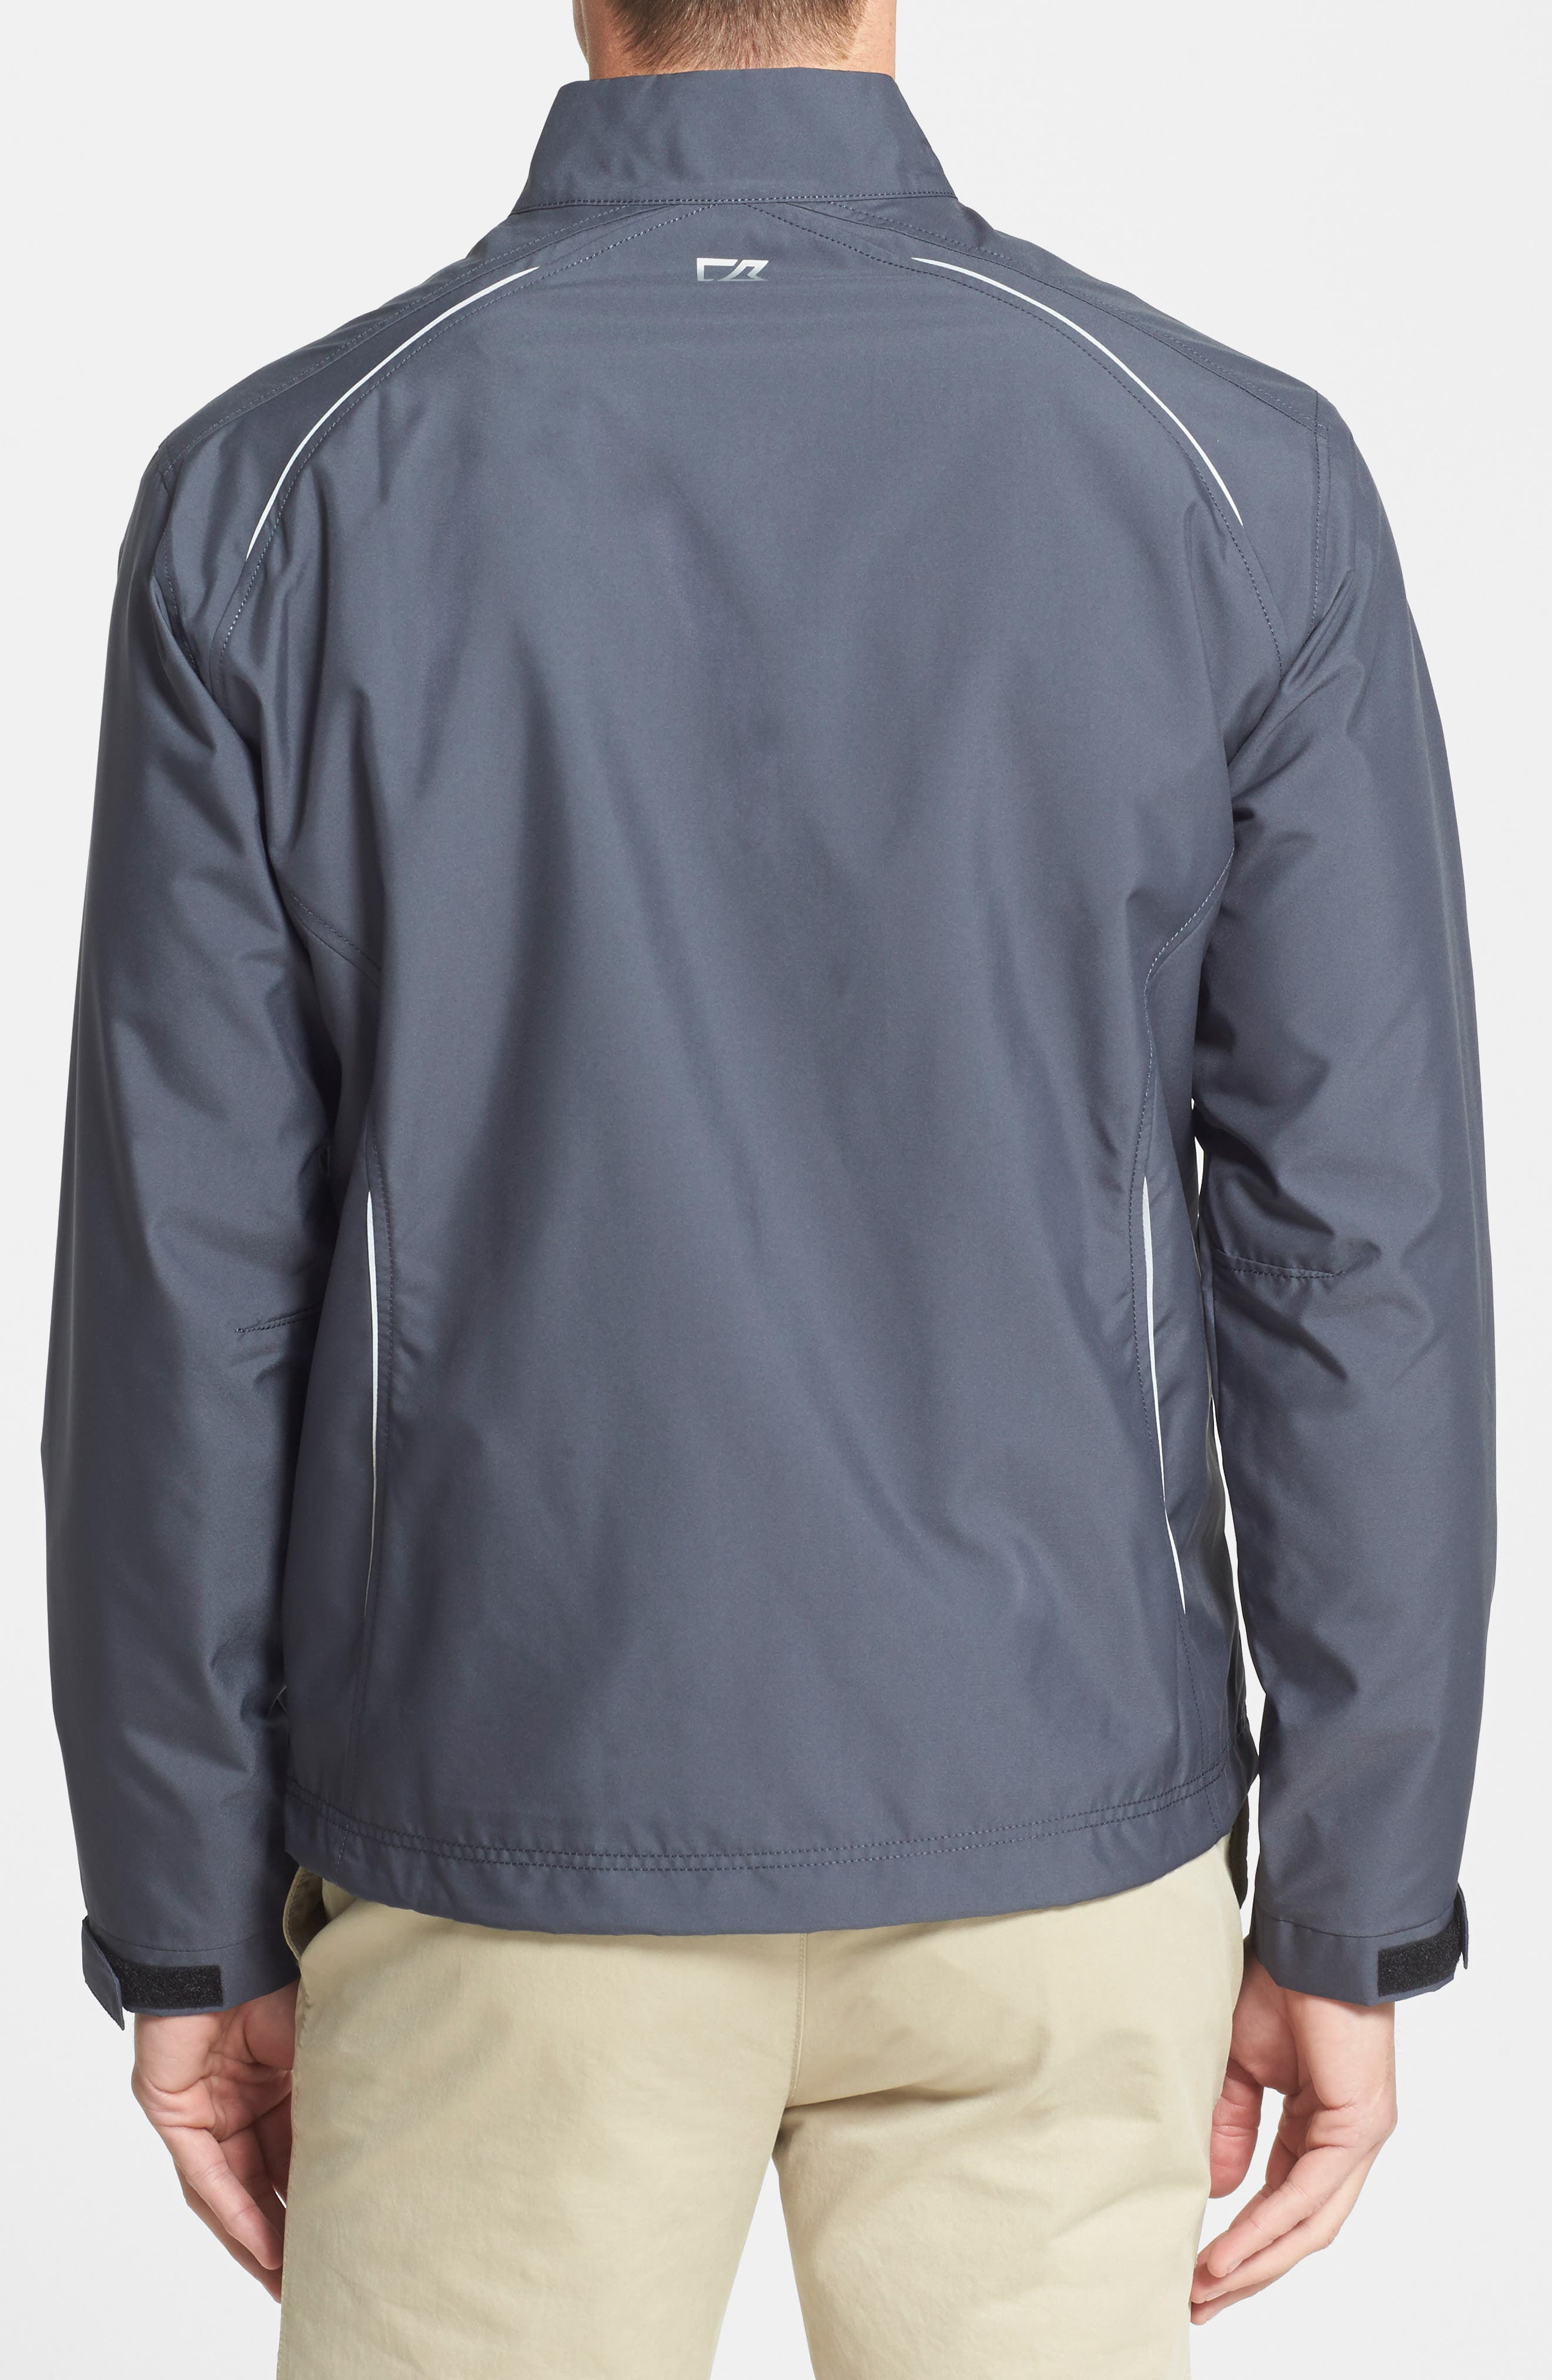 CUTTER & BUCK, Beacon WeatherTec Wind & Water Resistant Jacket, Alternate thumbnail 4, color, ONYX GREY